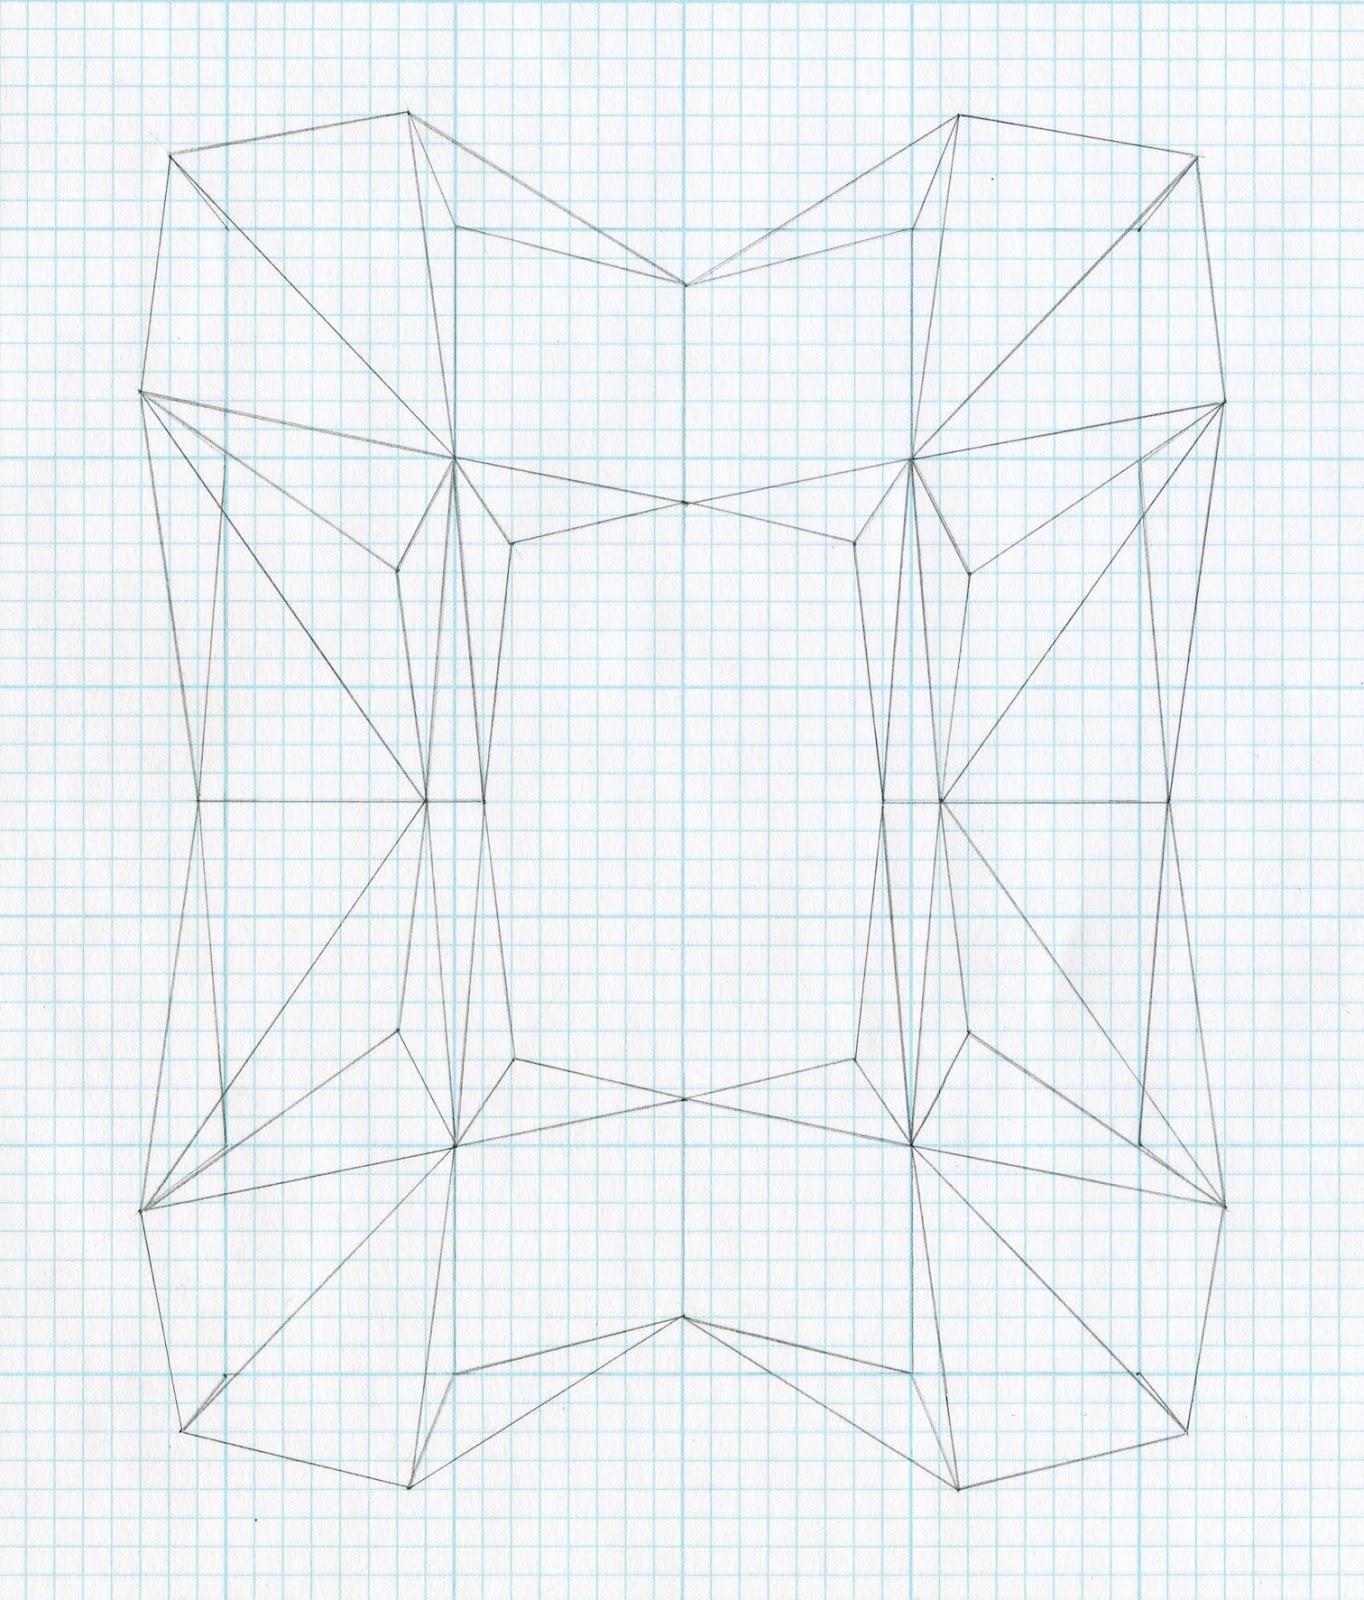 Graph Paper 8.5 X 11 8.5 x 11 inches